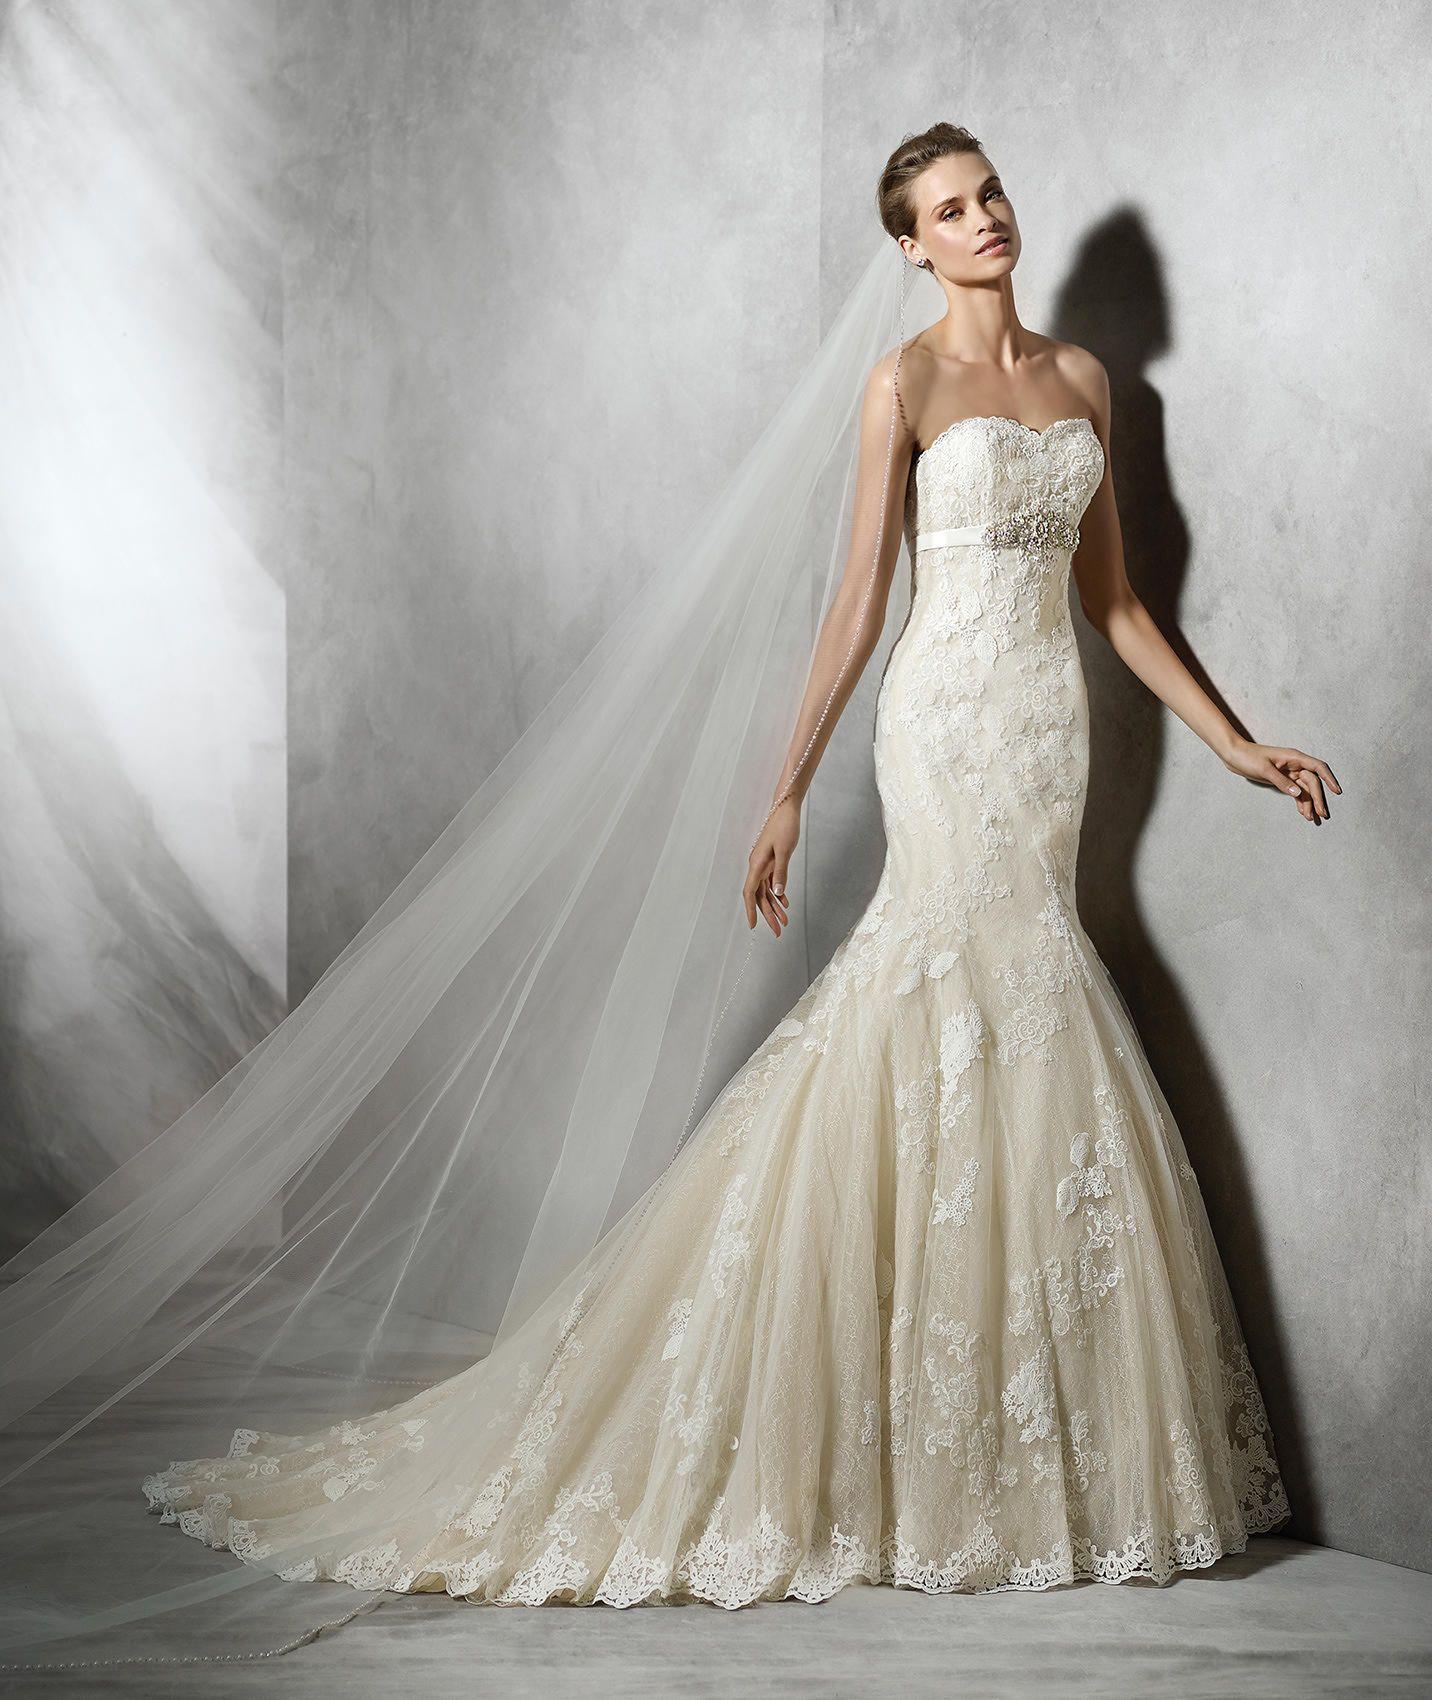 Mermaid Sweetheart Applique Chapel Train Champagne Wedding Dress